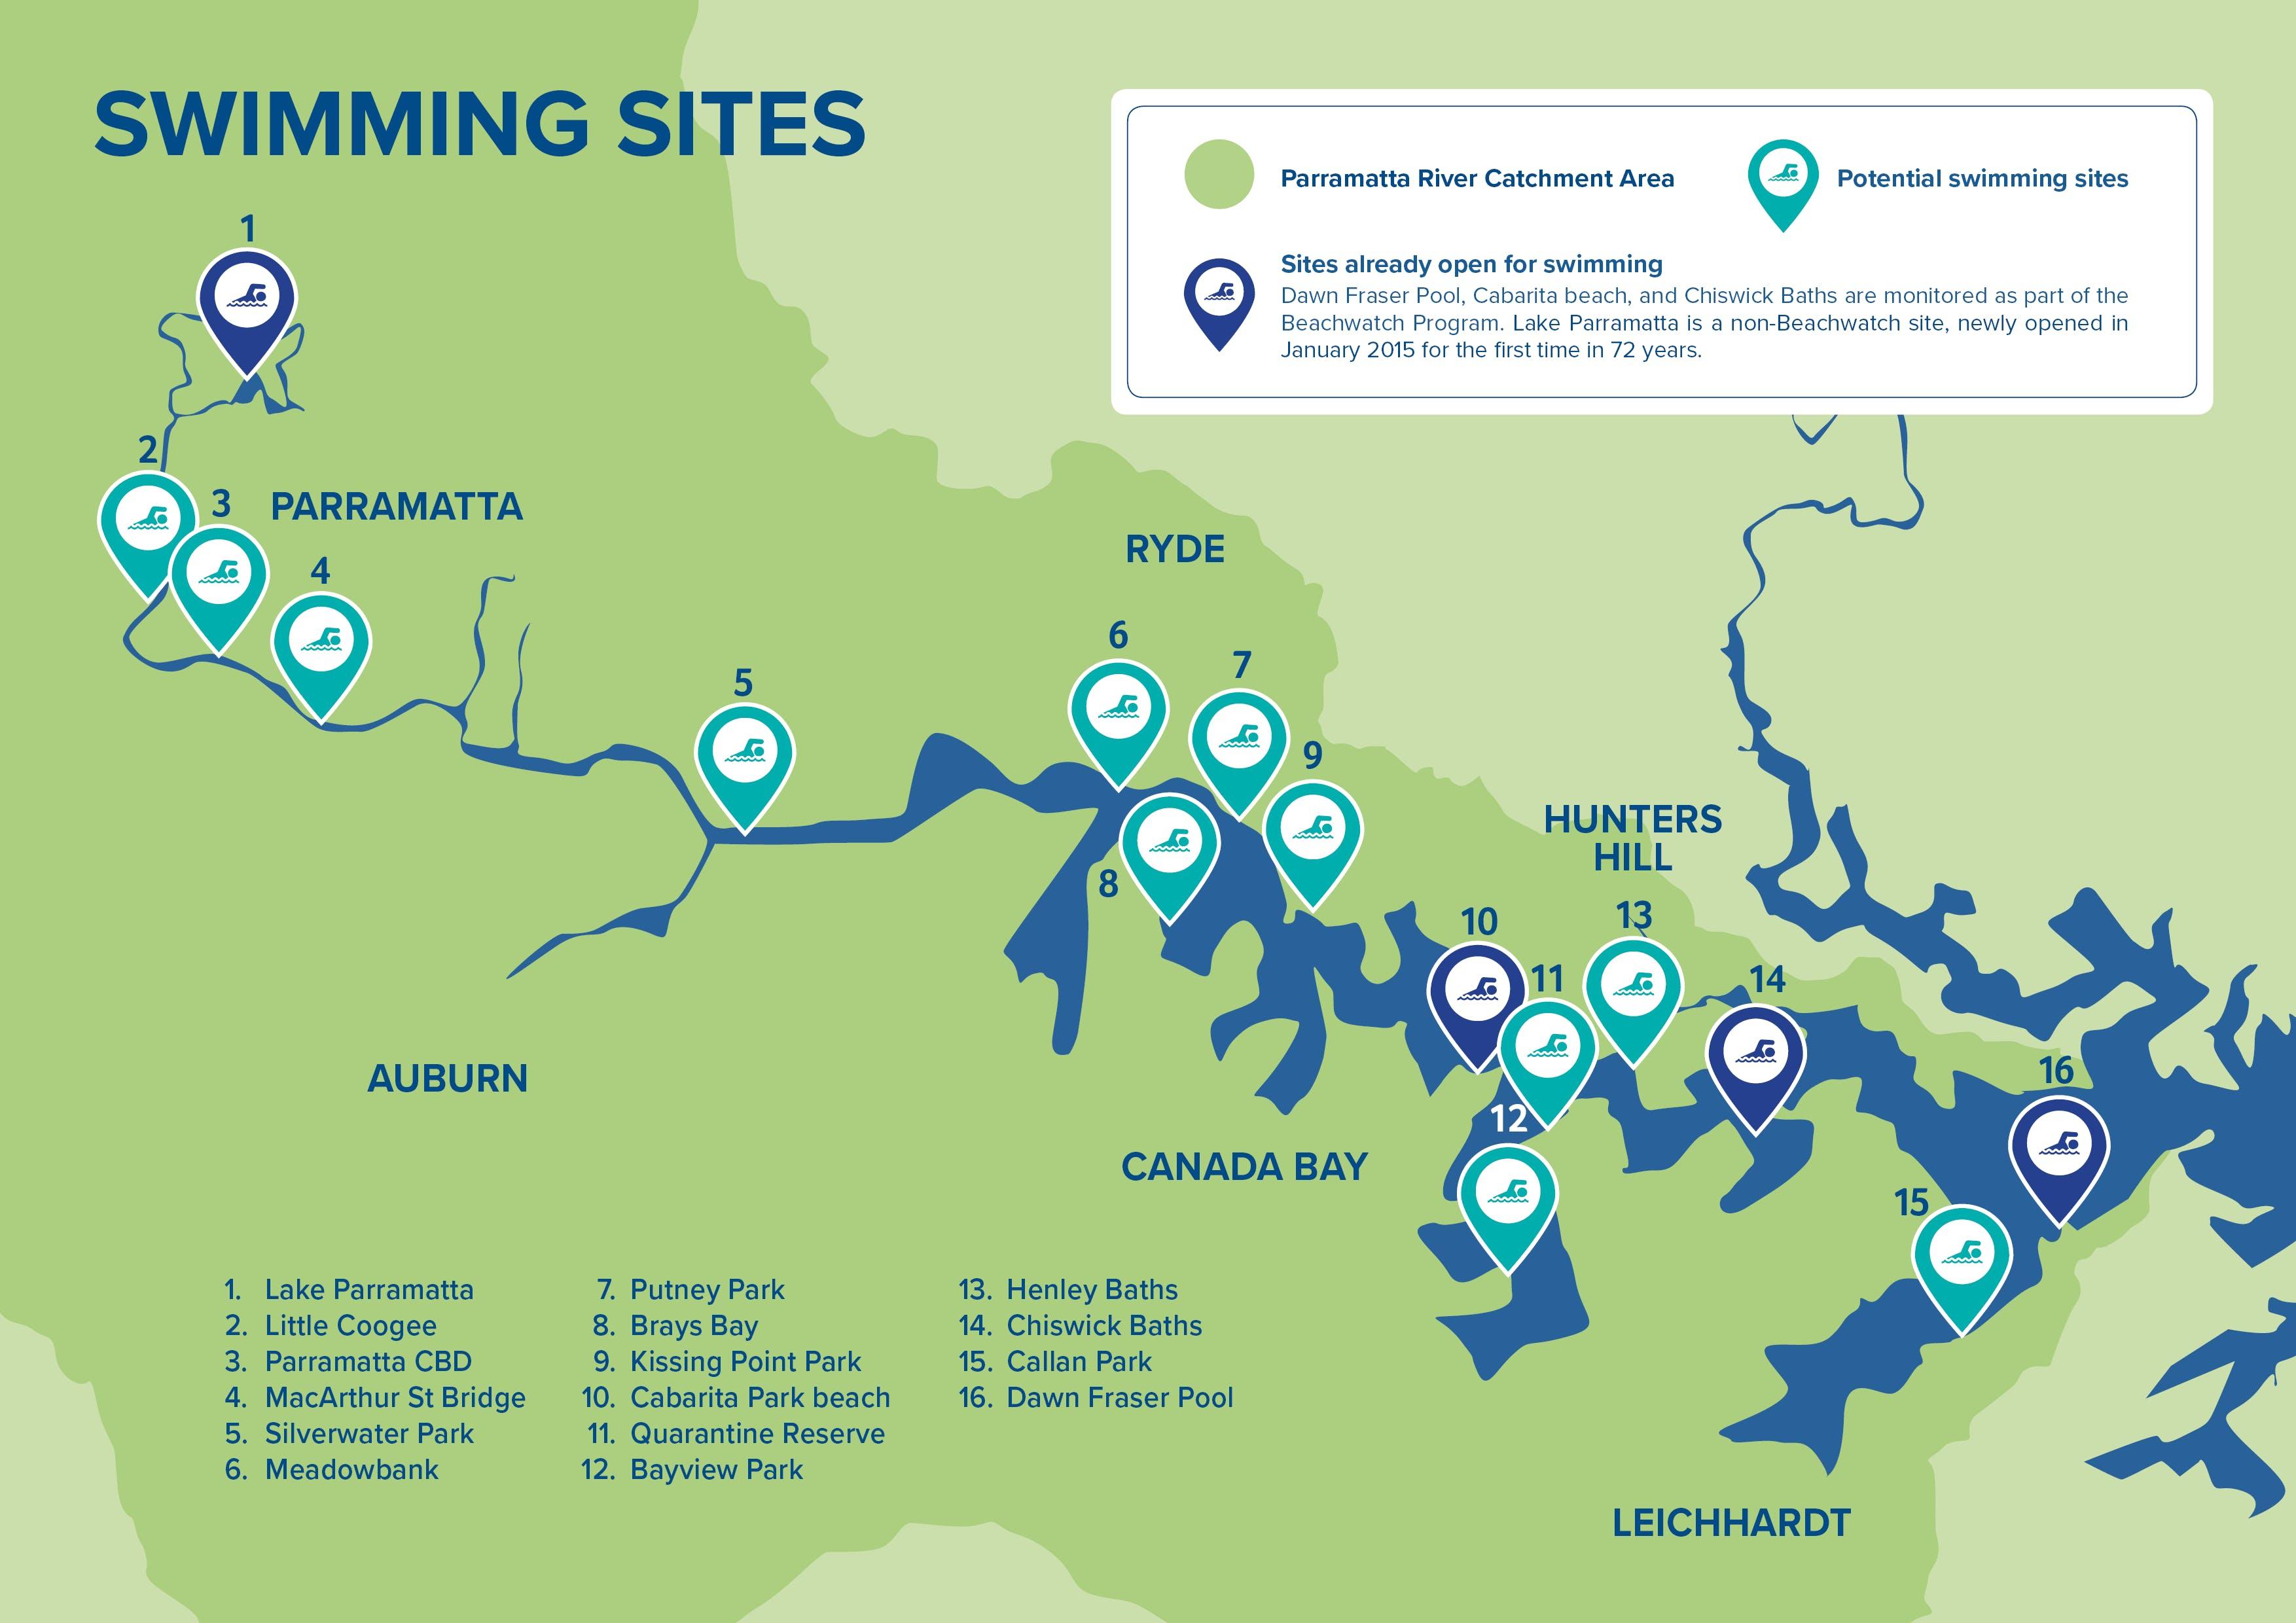 Potential Swim Site Map August 2018